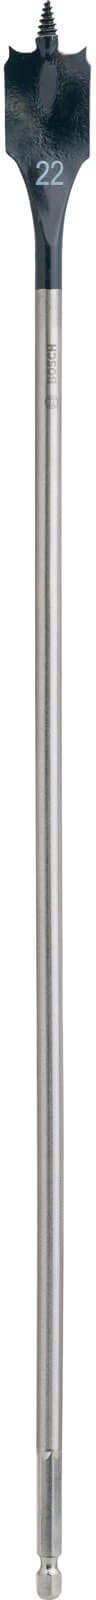 Bosch Self Cut Speed Hex Shank Flat Drill Bit 22mm 400mm